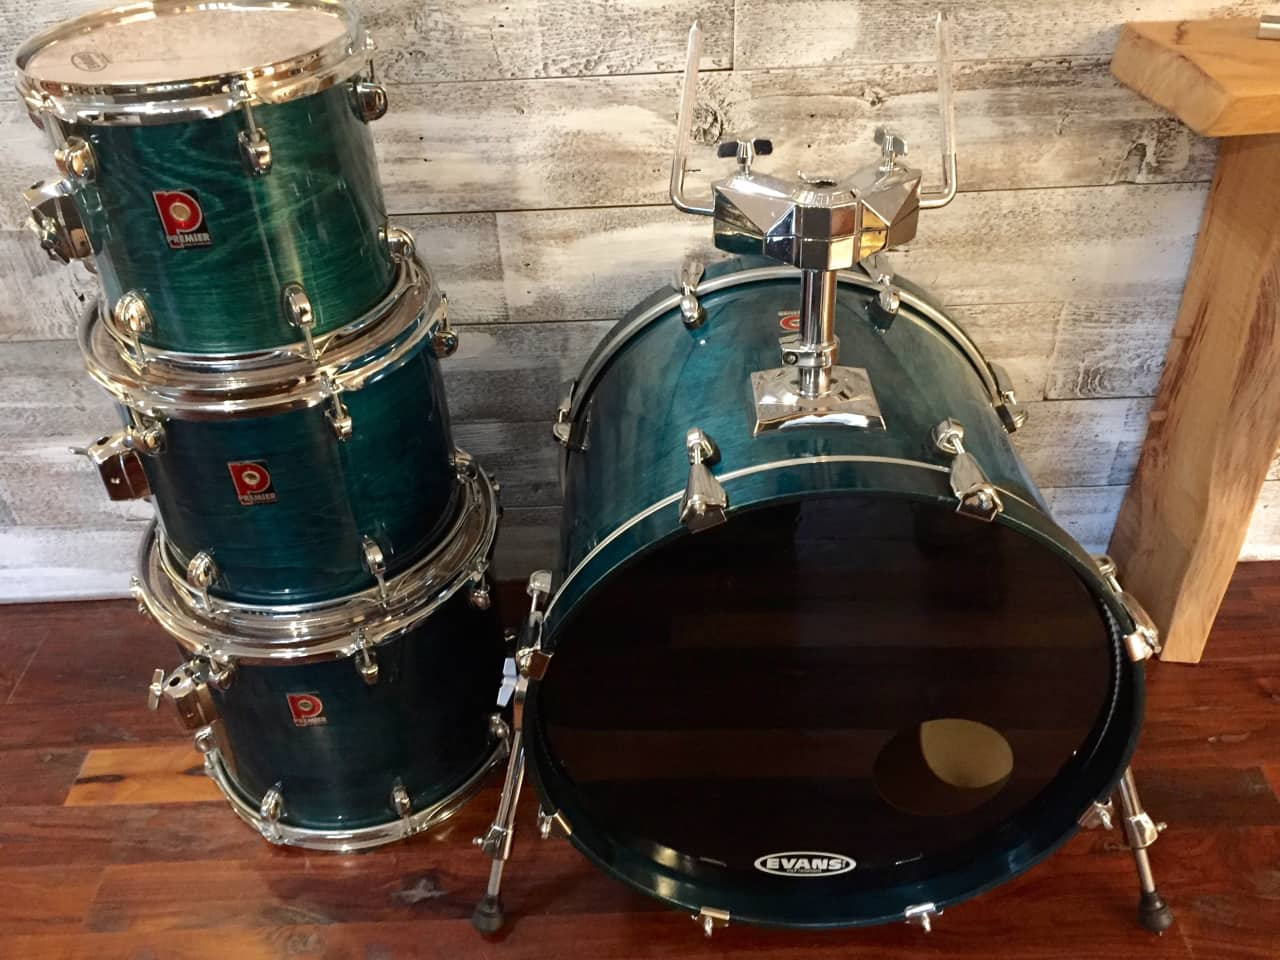 premier xpk birch eucalyptus shell drums blue green lacquer reverb. Black Bedroom Furniture Sets. Home Design Ideas